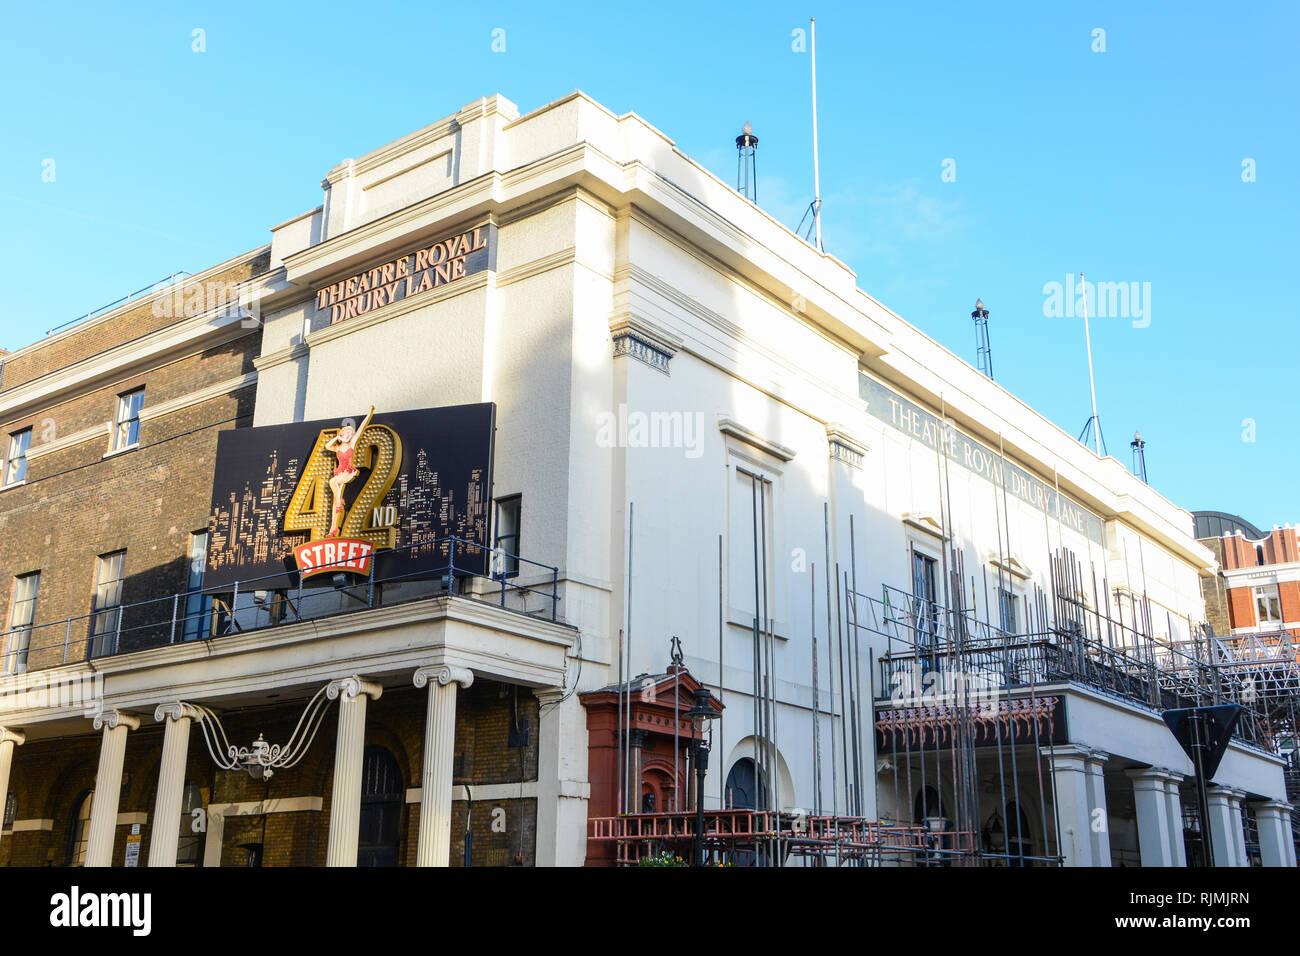 The exterior of the Theatre Royal, Drury Lane undergoing a £45 million refurbishment - Stock Image